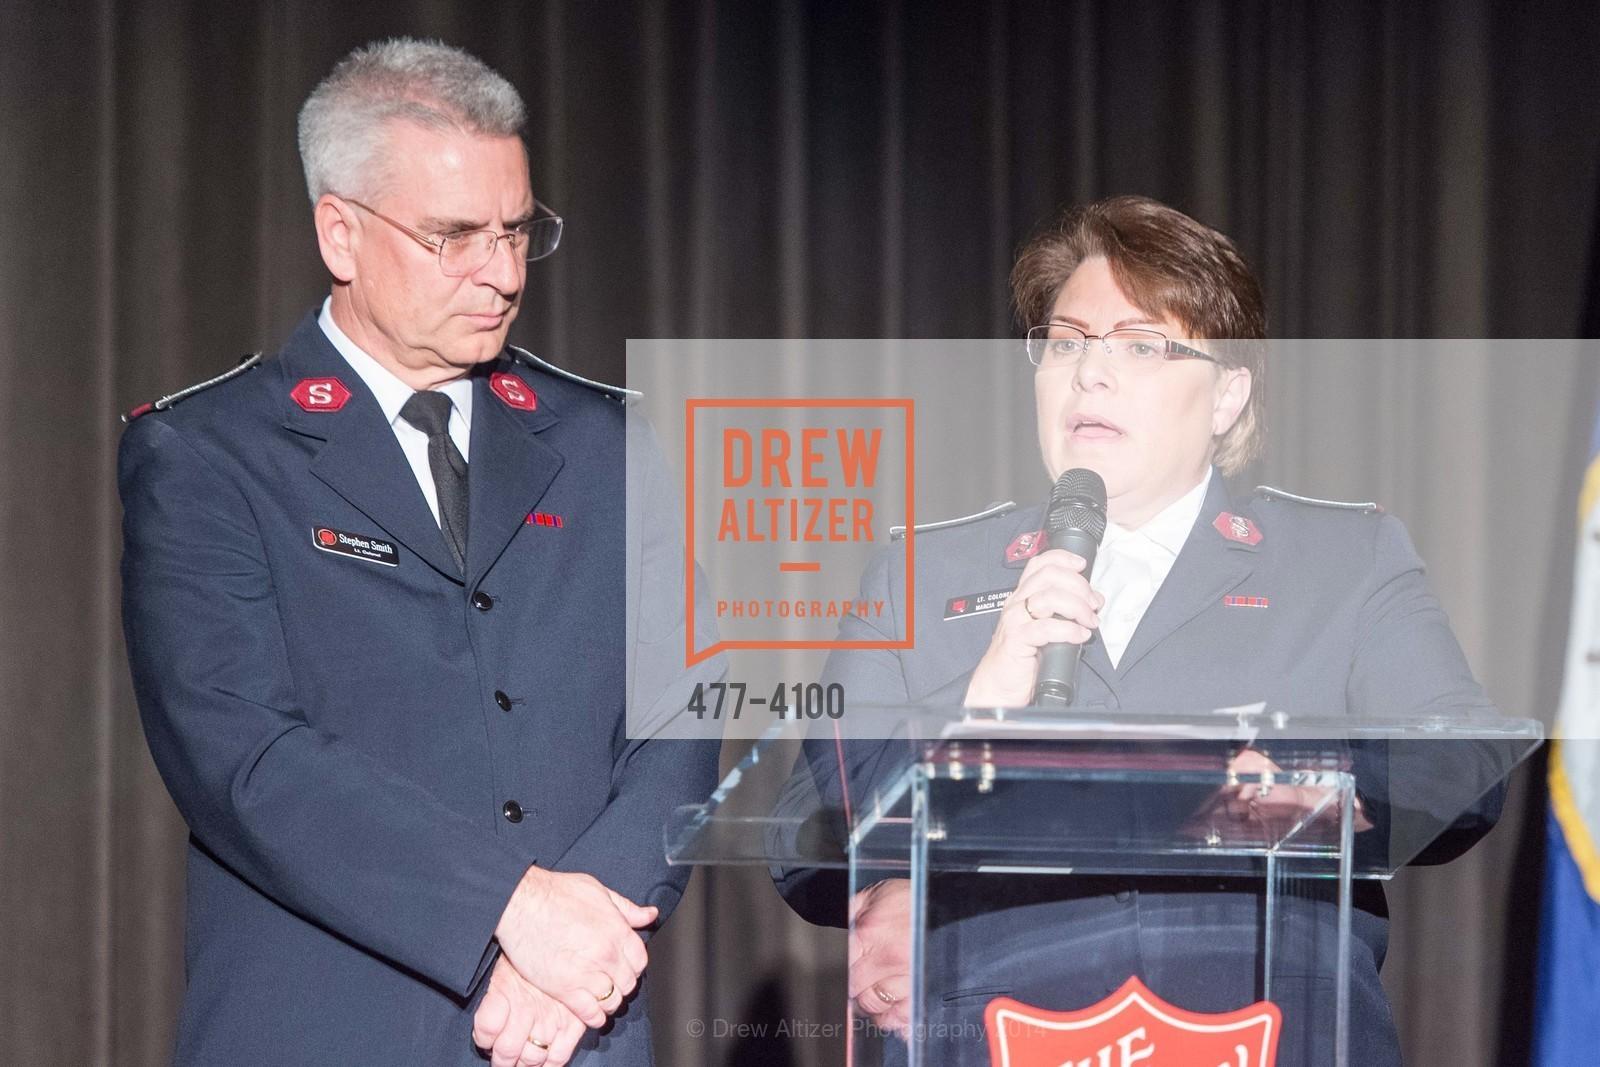 Lt.Col. Stephen Smith, Lt.Col. Marcia Smith, Photo #477-4100